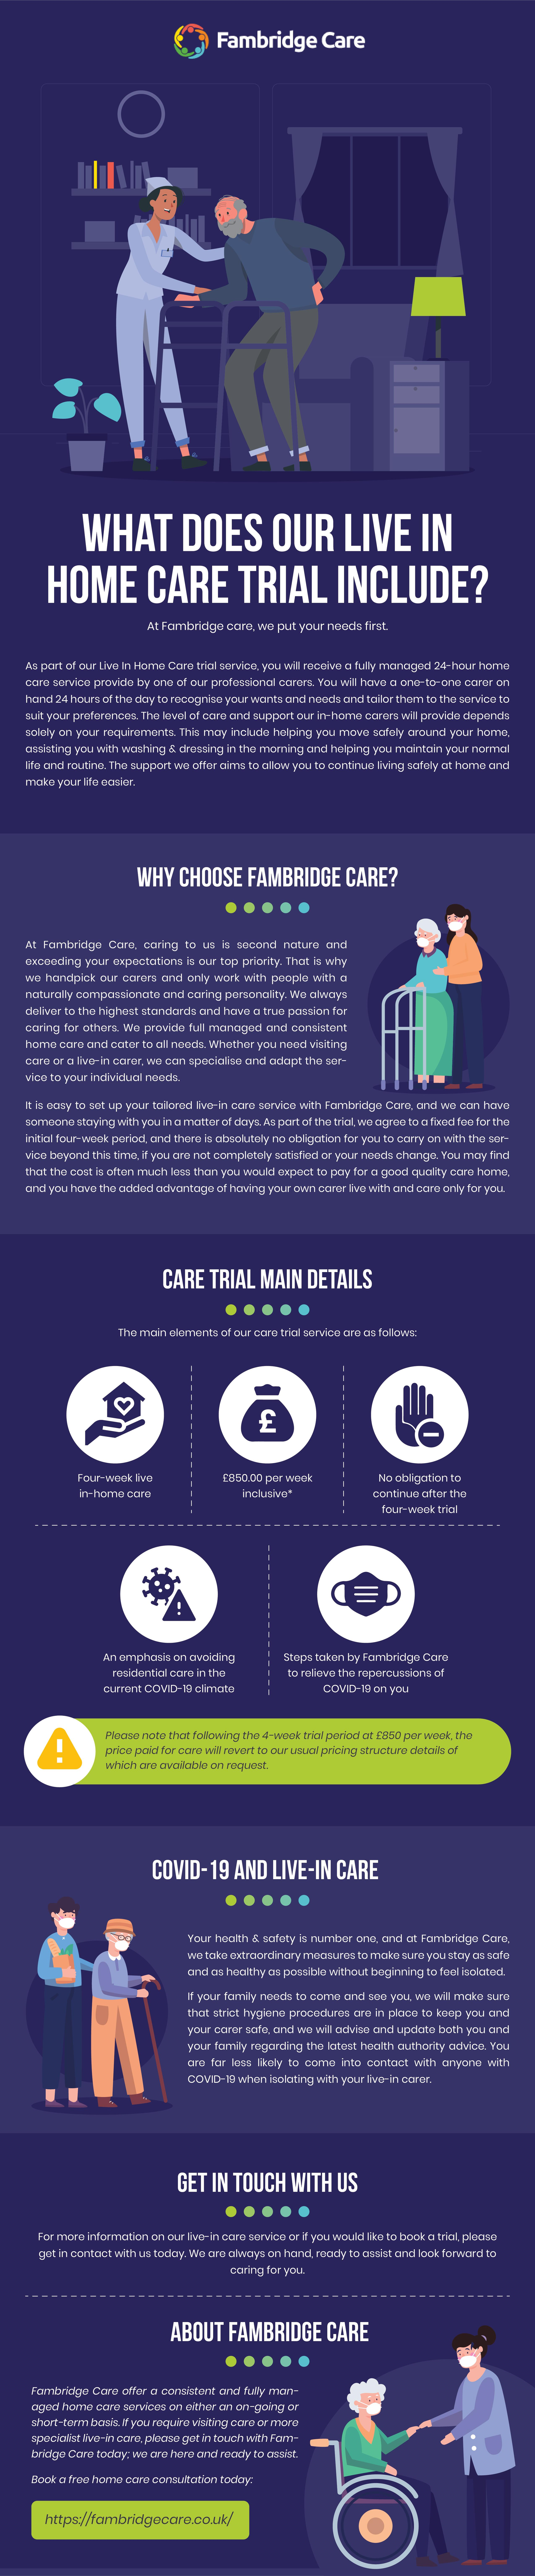 Fambridge Care Infographic